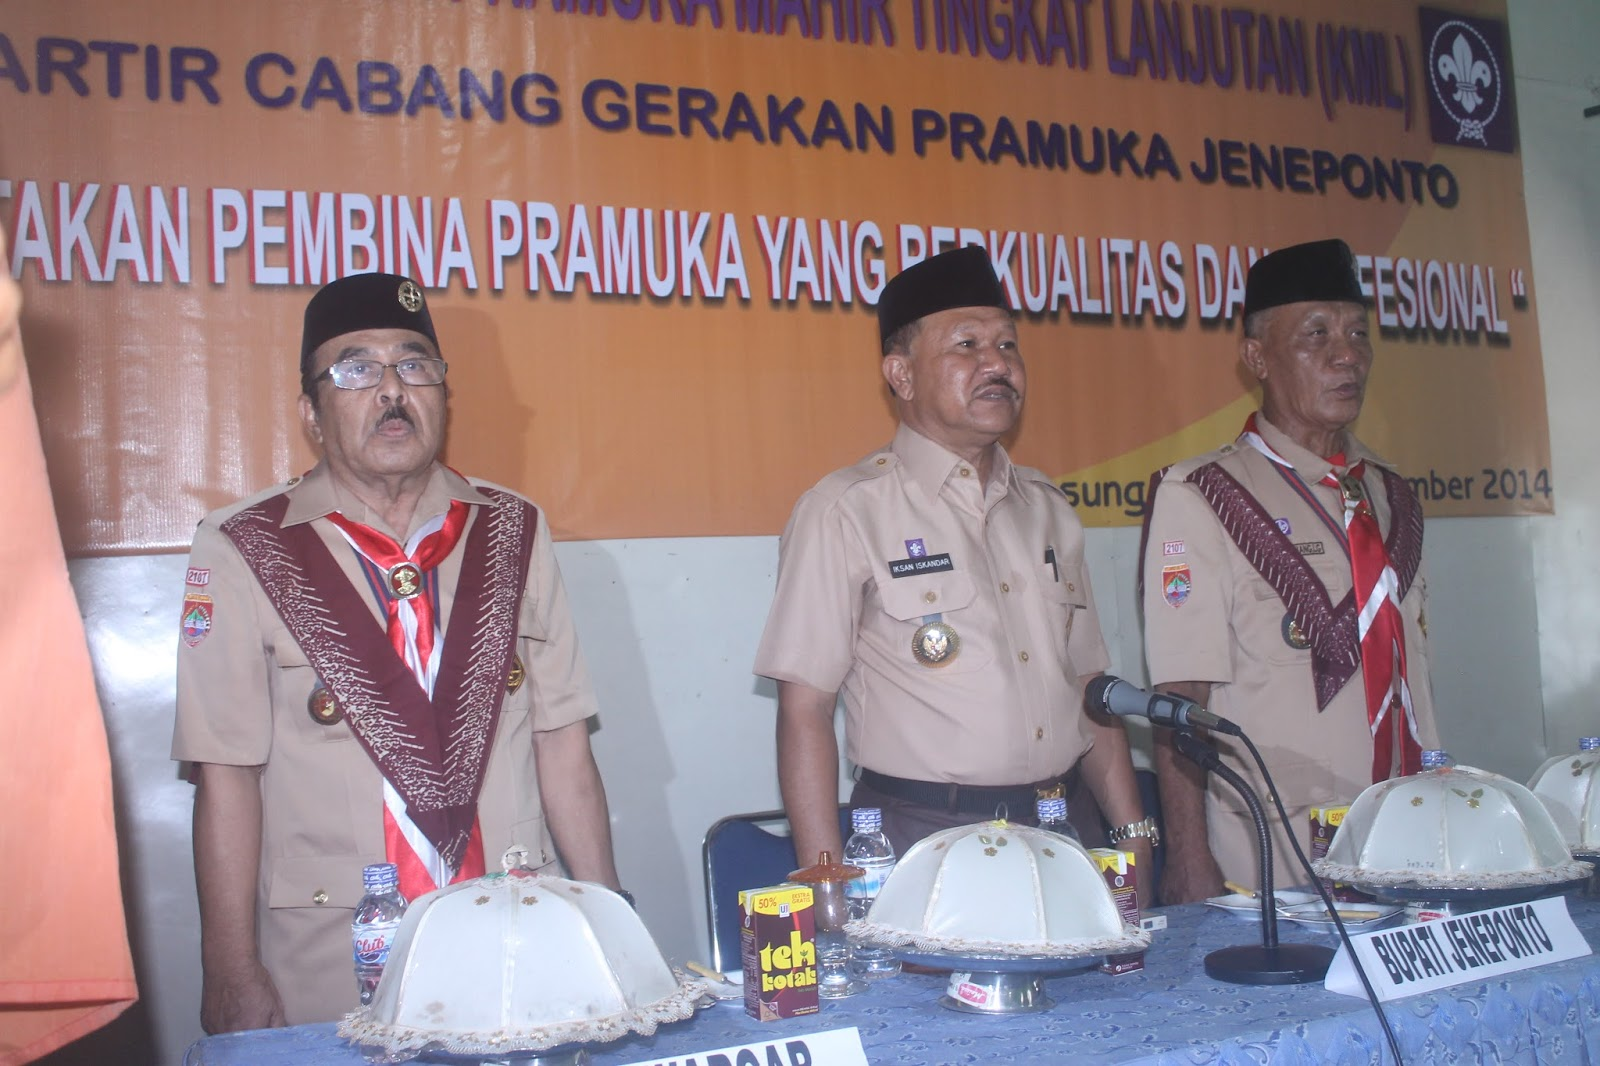 Waduh, Kontigen Pramuka Jeneponto Terpaksa Berutang Untuk Berangkat Ke Cibubur Jawa Barat